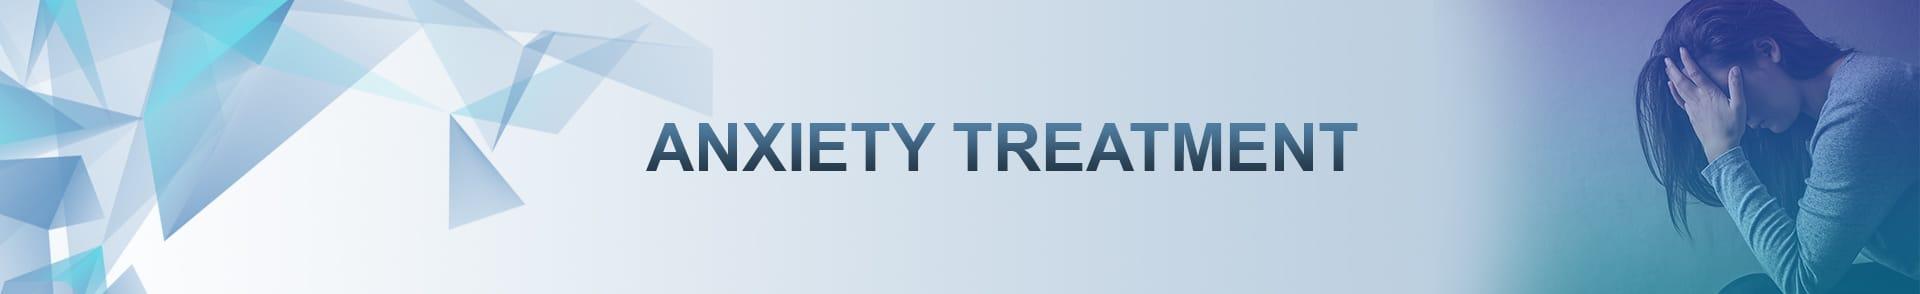 ANXIETY TREATMENT in Delhi